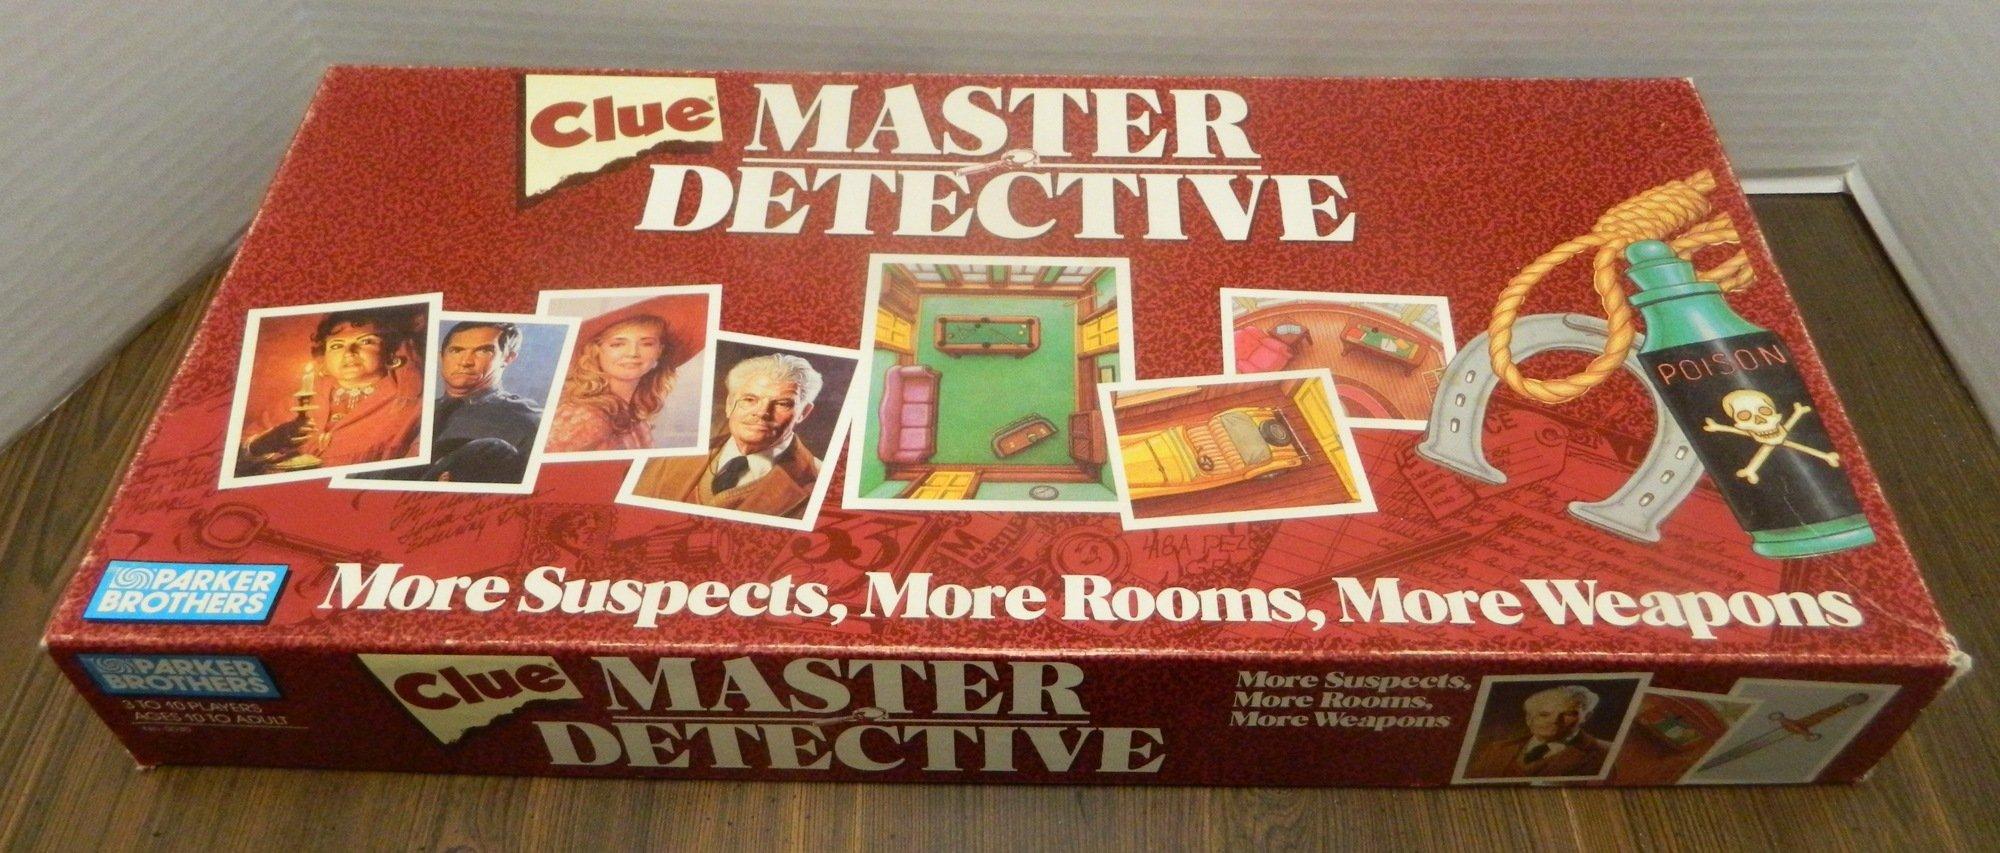 Clue Master Detective Box